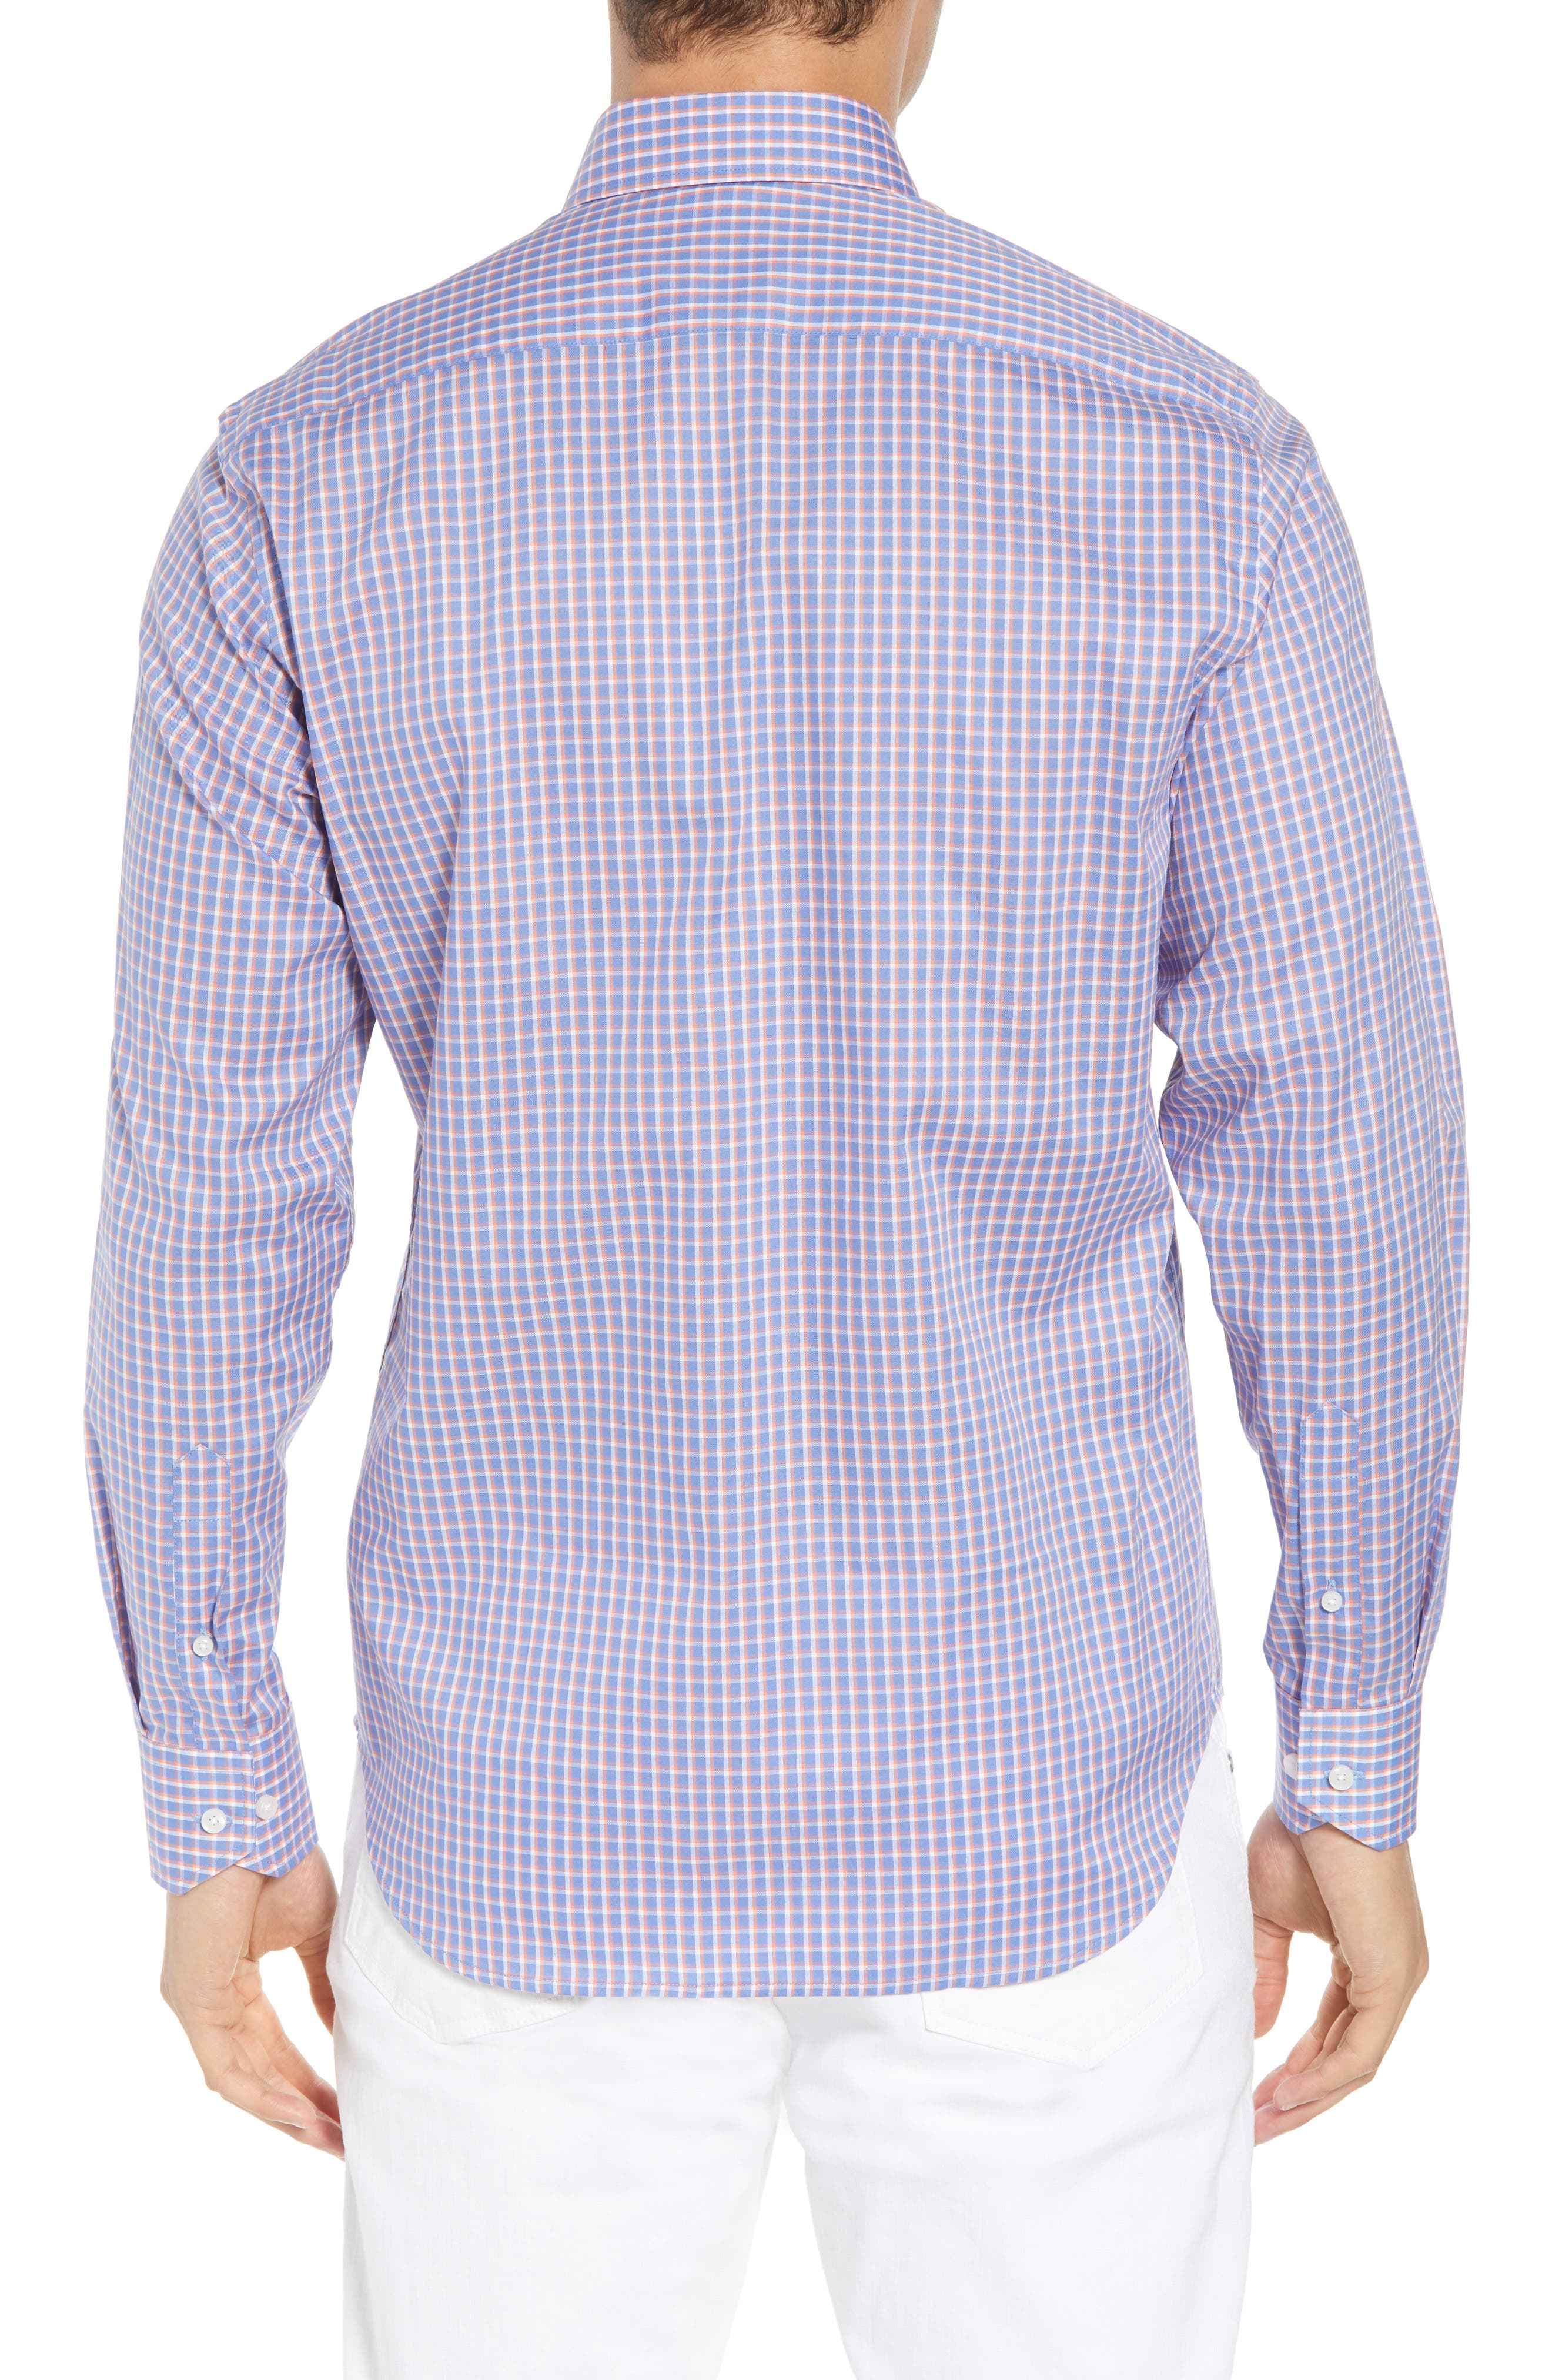 Bader Regular Fit Check Sport Shirt,                             Alternate thumbnail 2, color,                             400